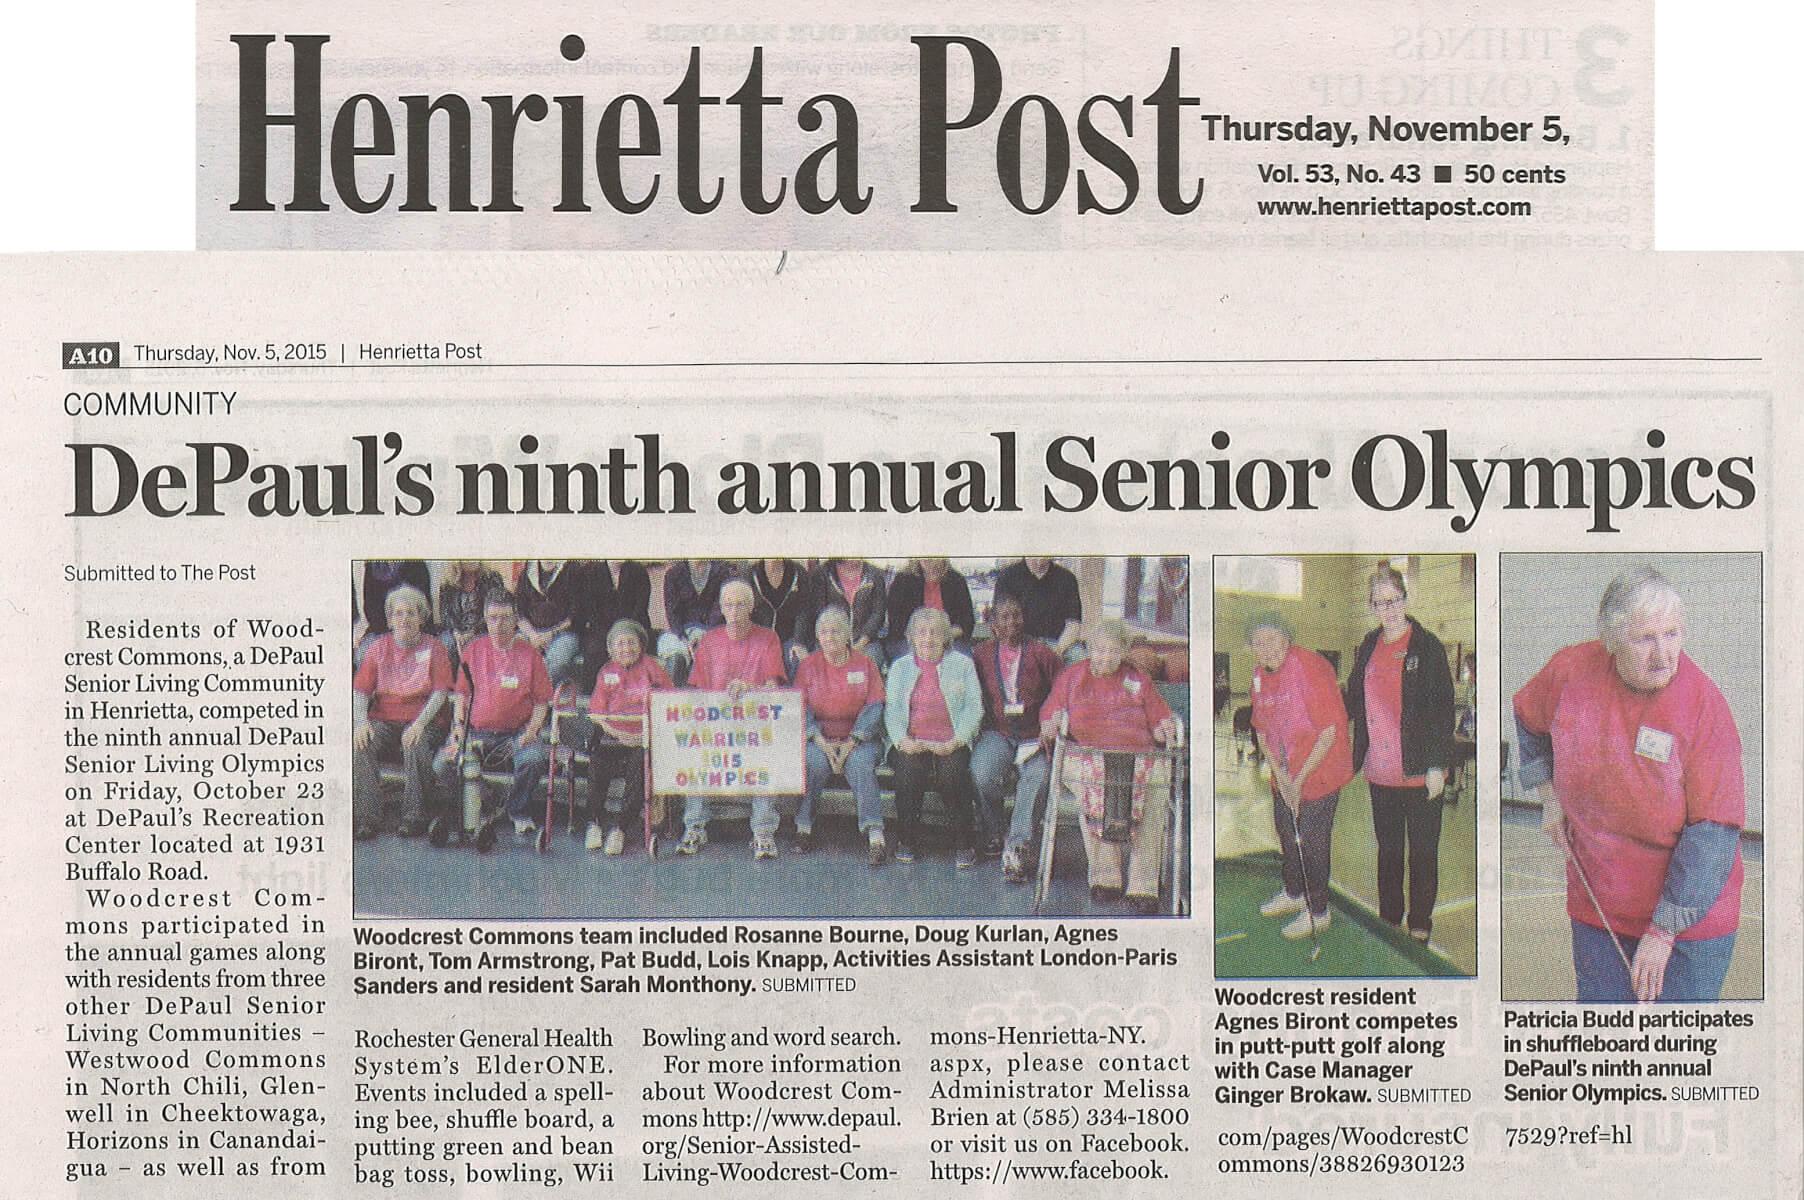 DePaul's Ninth Annual Senior Olympics article in the Henrietta Post November 5, 2015